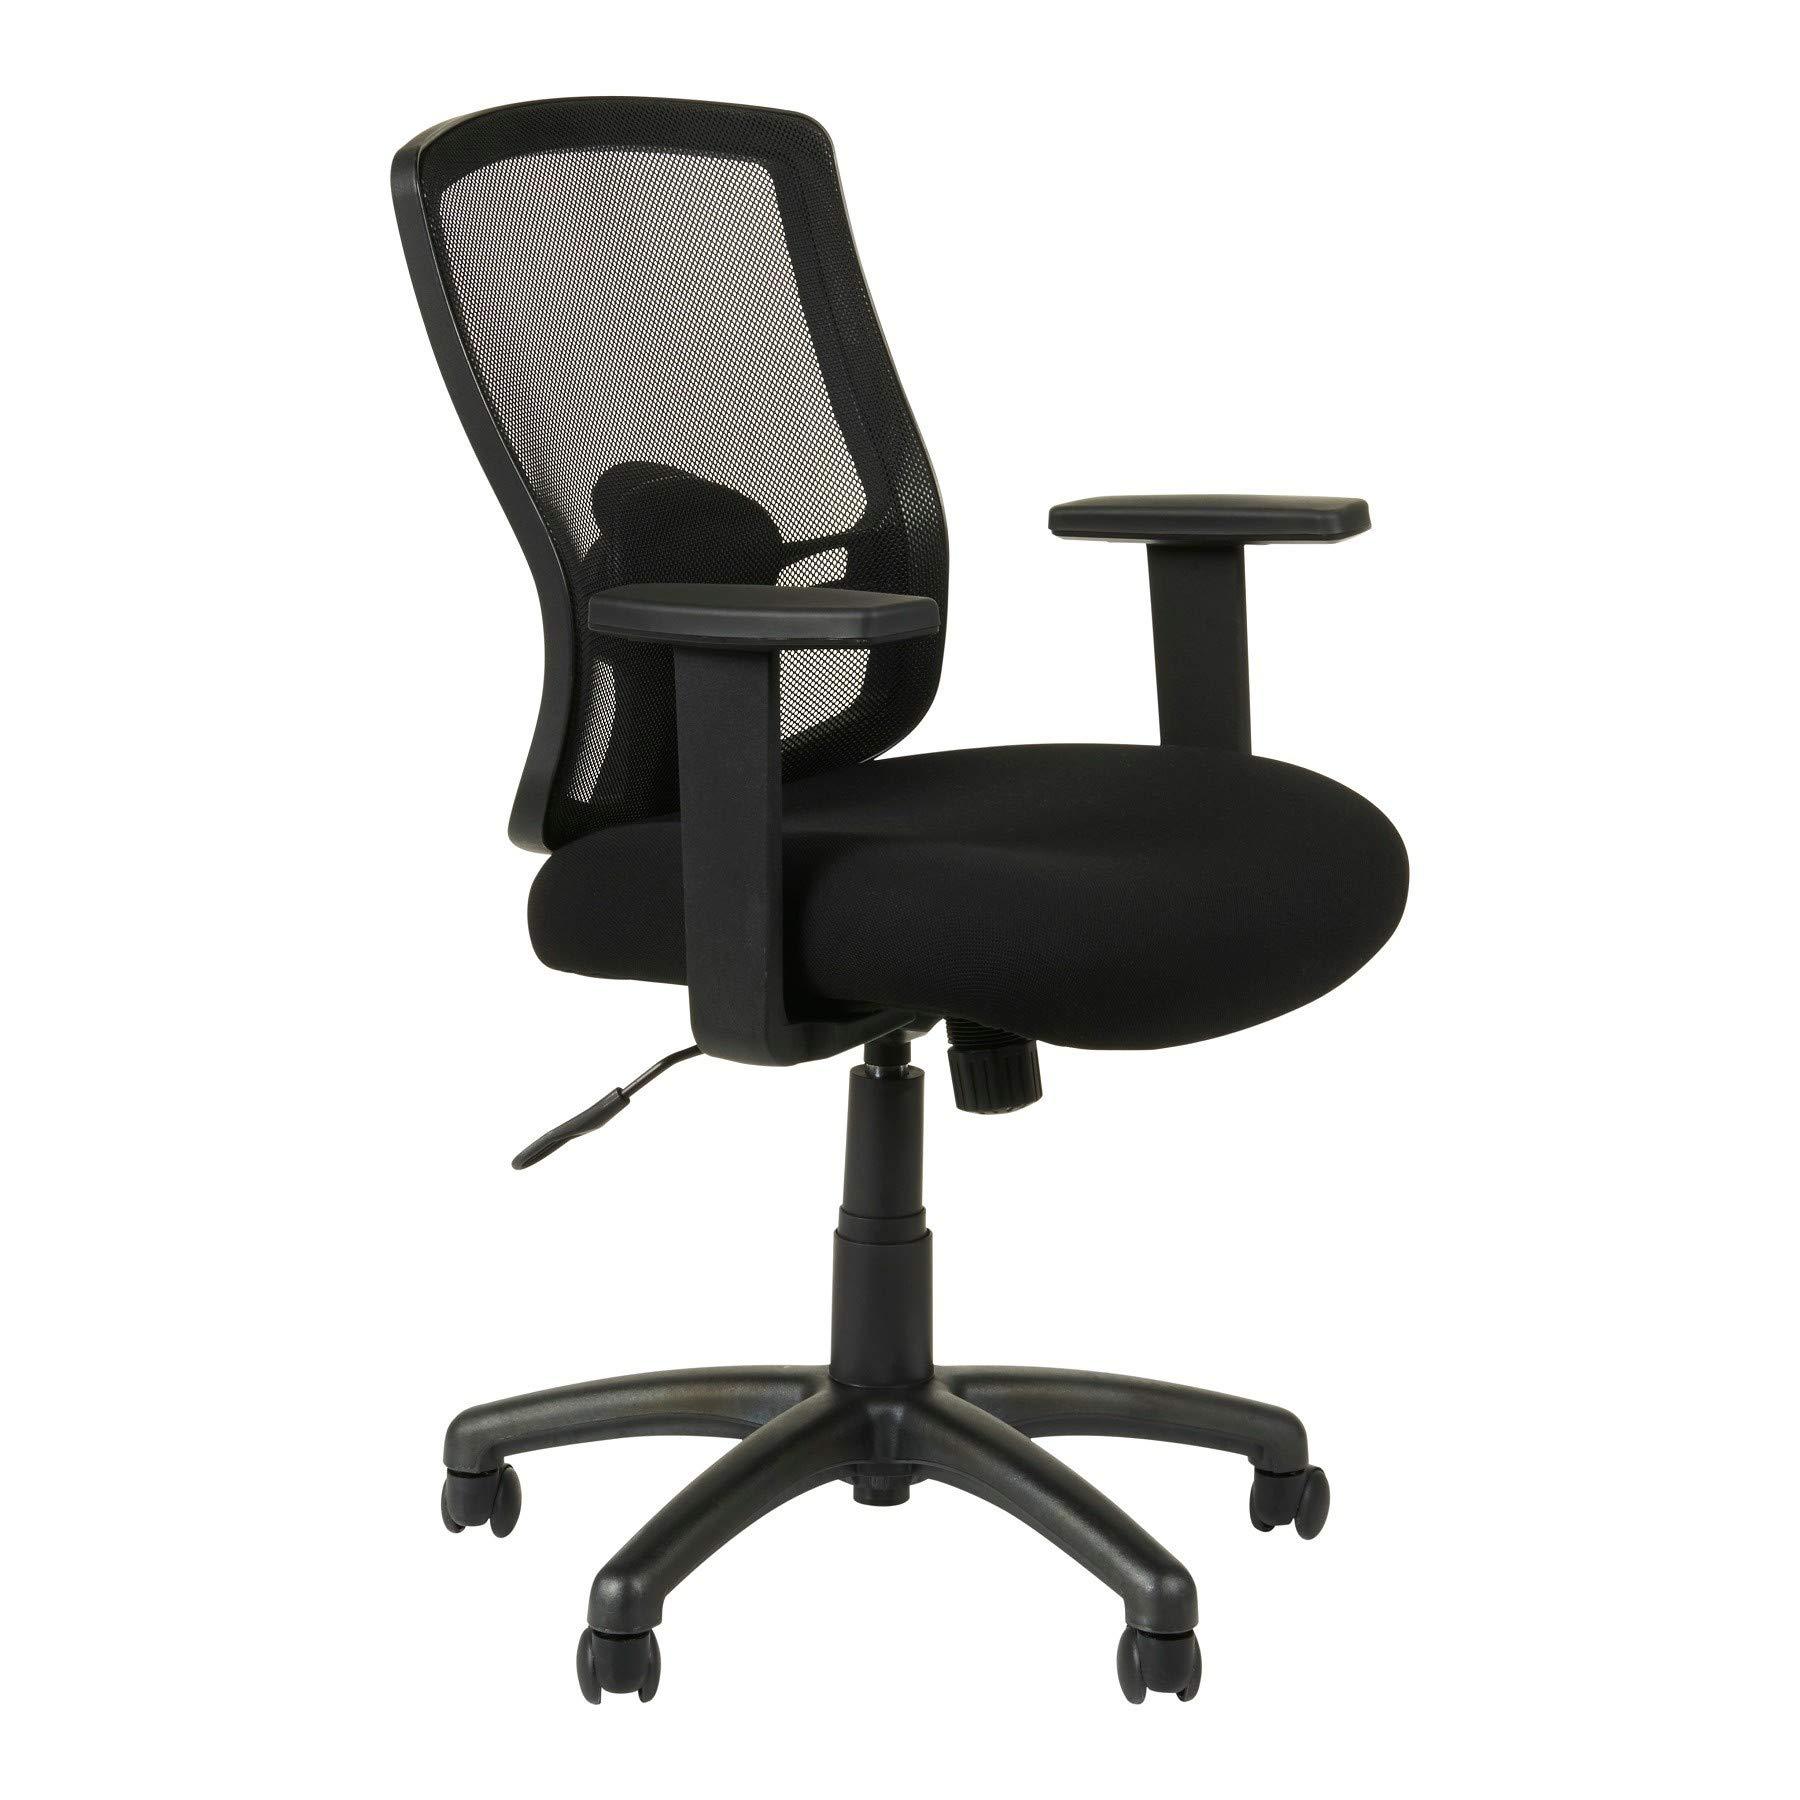 Alera Etros Series Mesh Mid-Back Swivel/Tilt Chair, Black